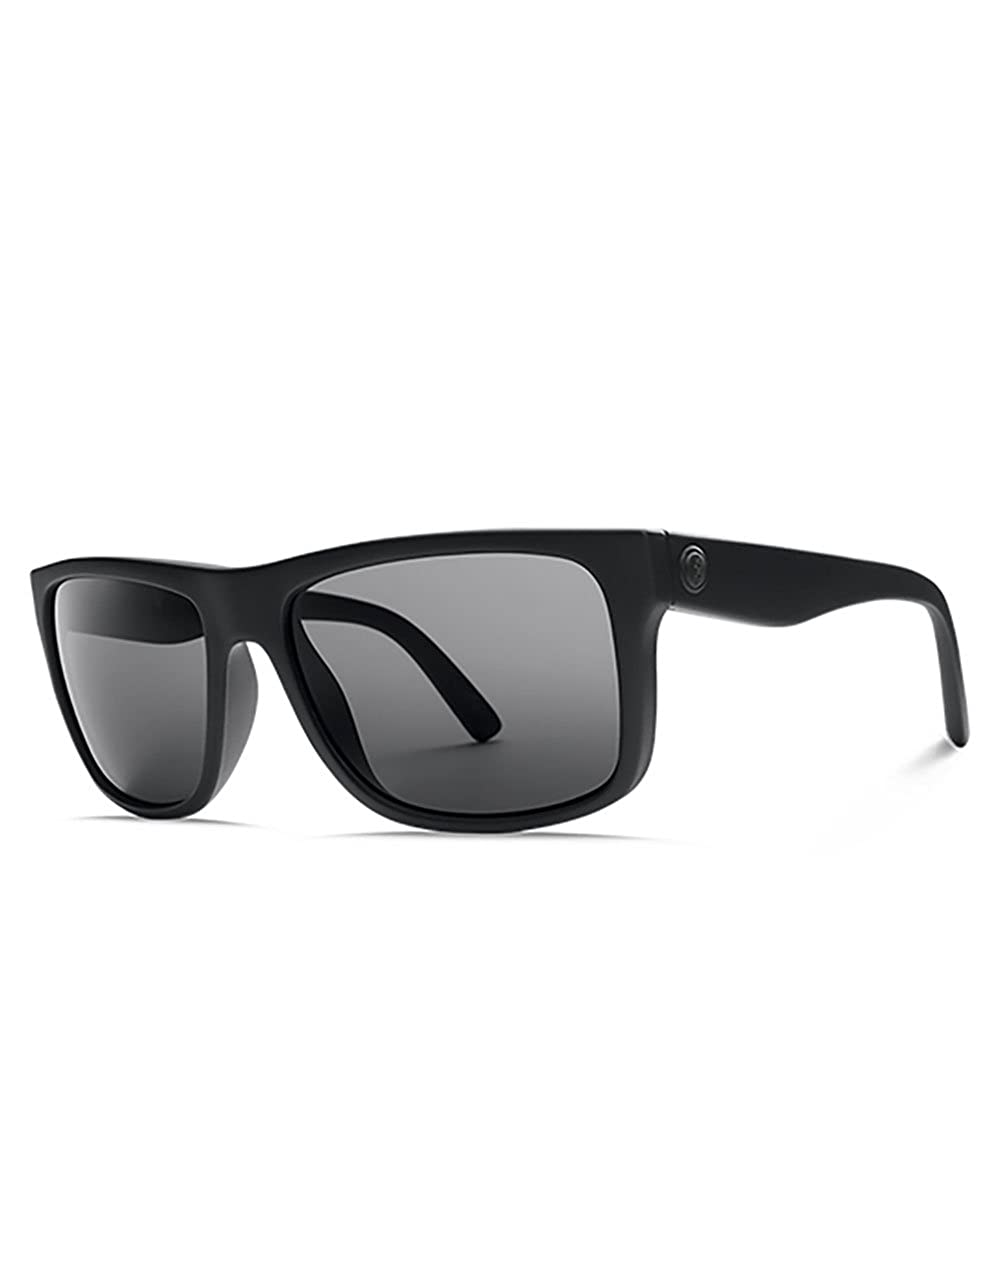 98ce0500f6 Amazon.com  Electric - Swingarm Sunglasses OHM Grey Polar Lens ...